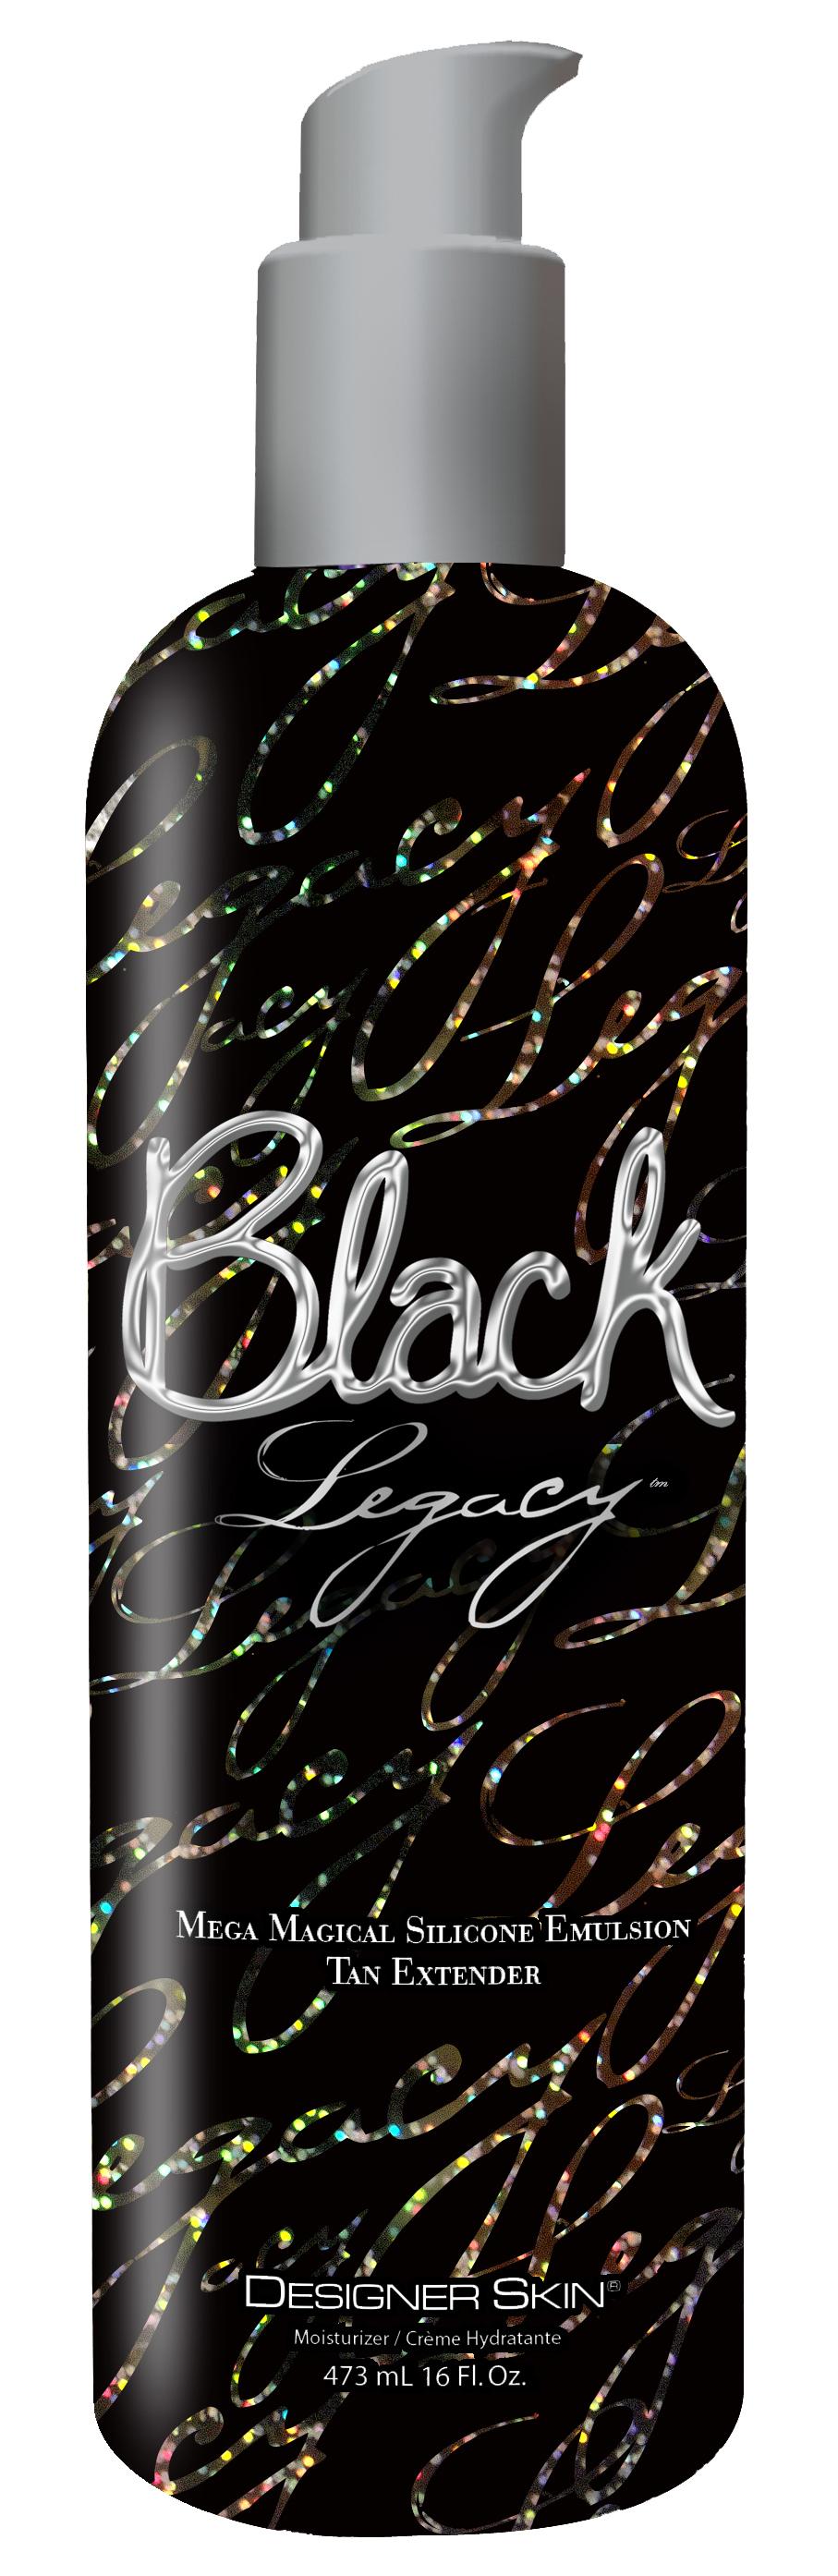 Black Legacy™ Tan Extender